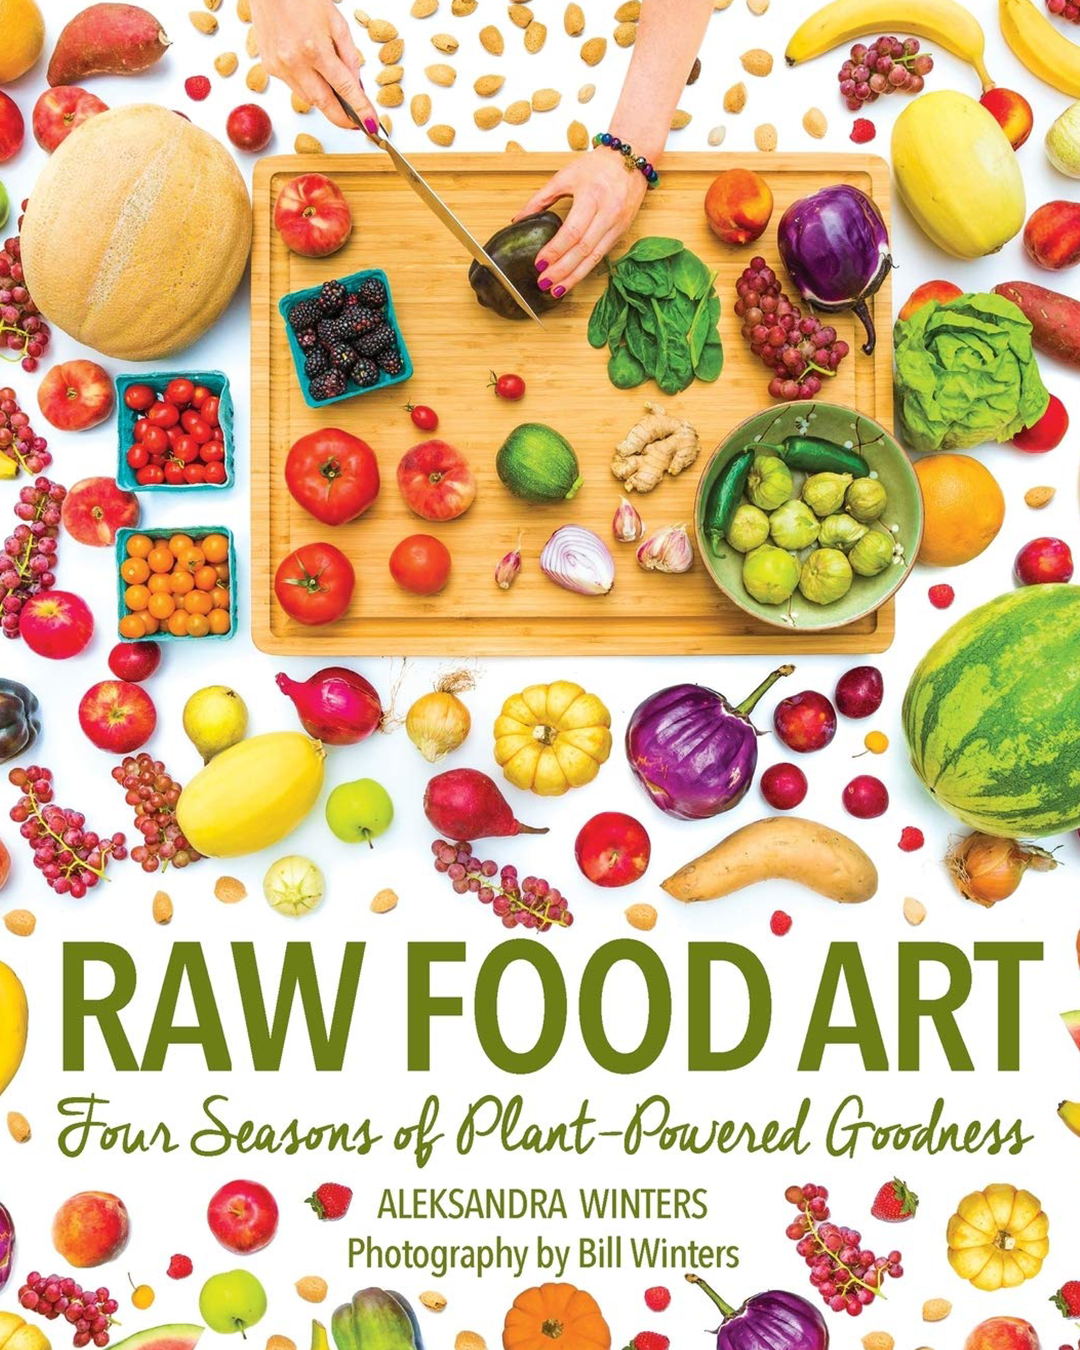 Raw Food Art Cookbook Cover